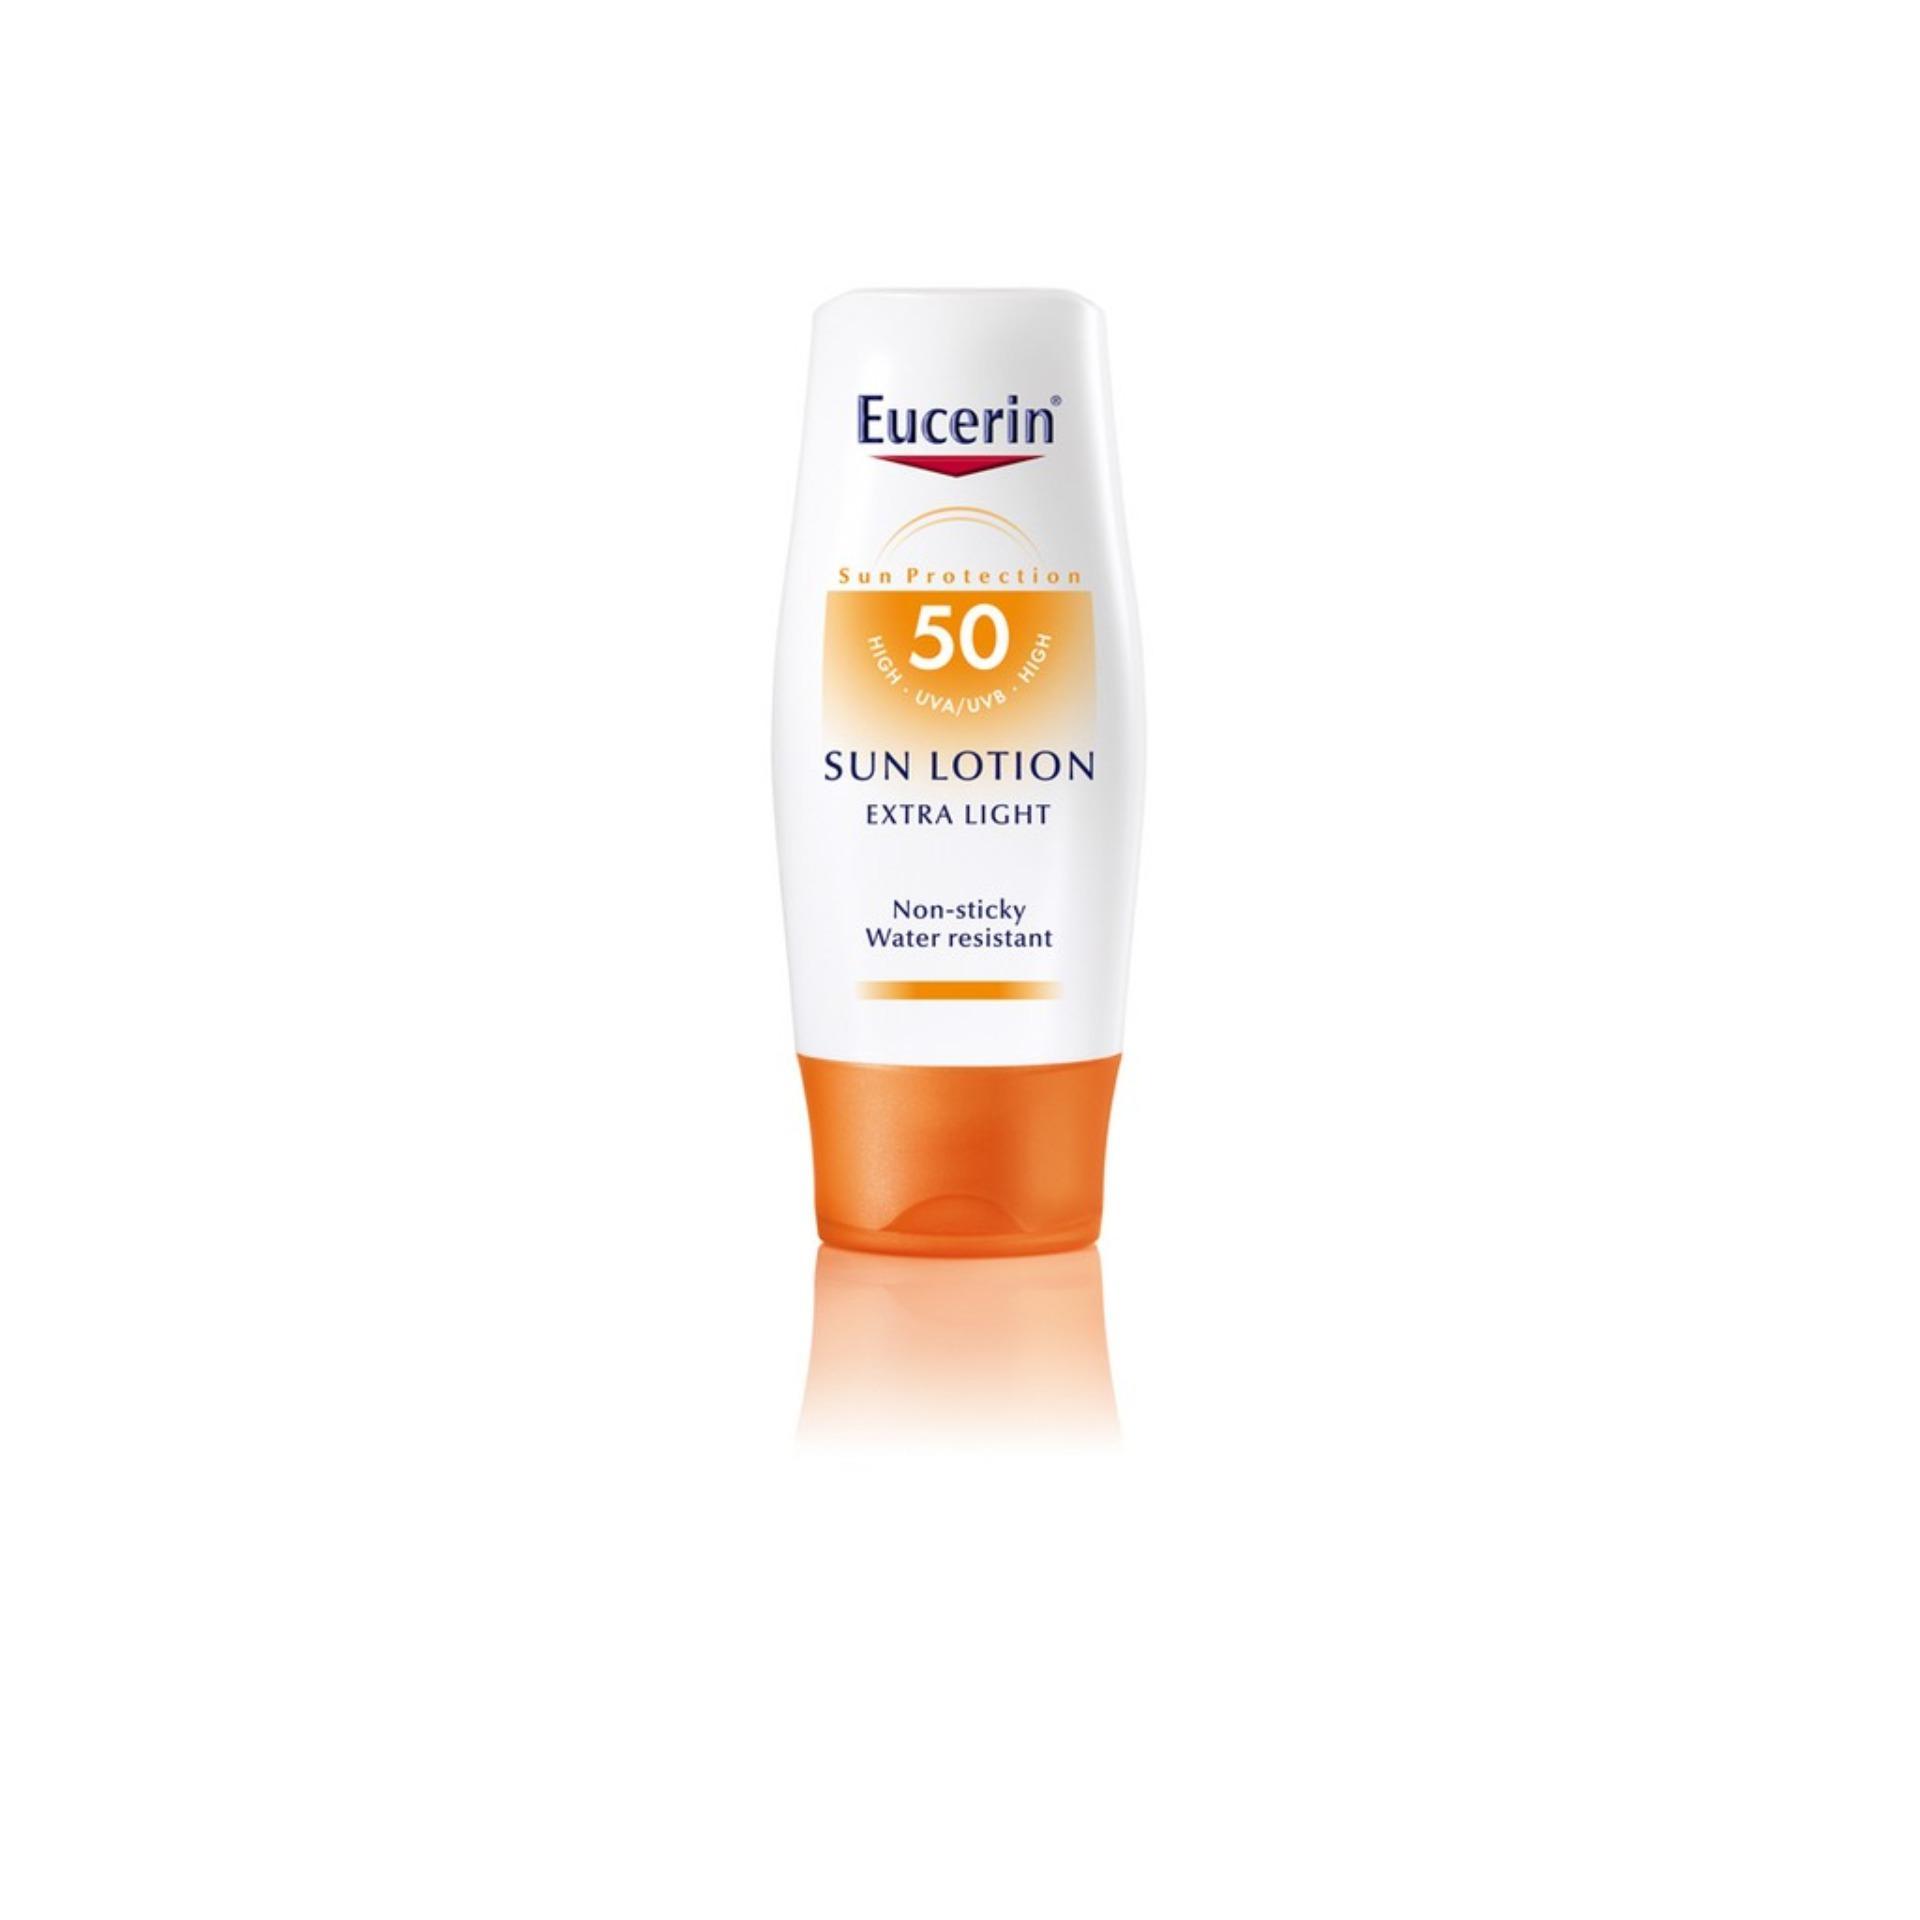 Eucerin Sun Care Unisex Sun Body Lotion Extra Light Spf50 150ml By Eucerin Official Shop.